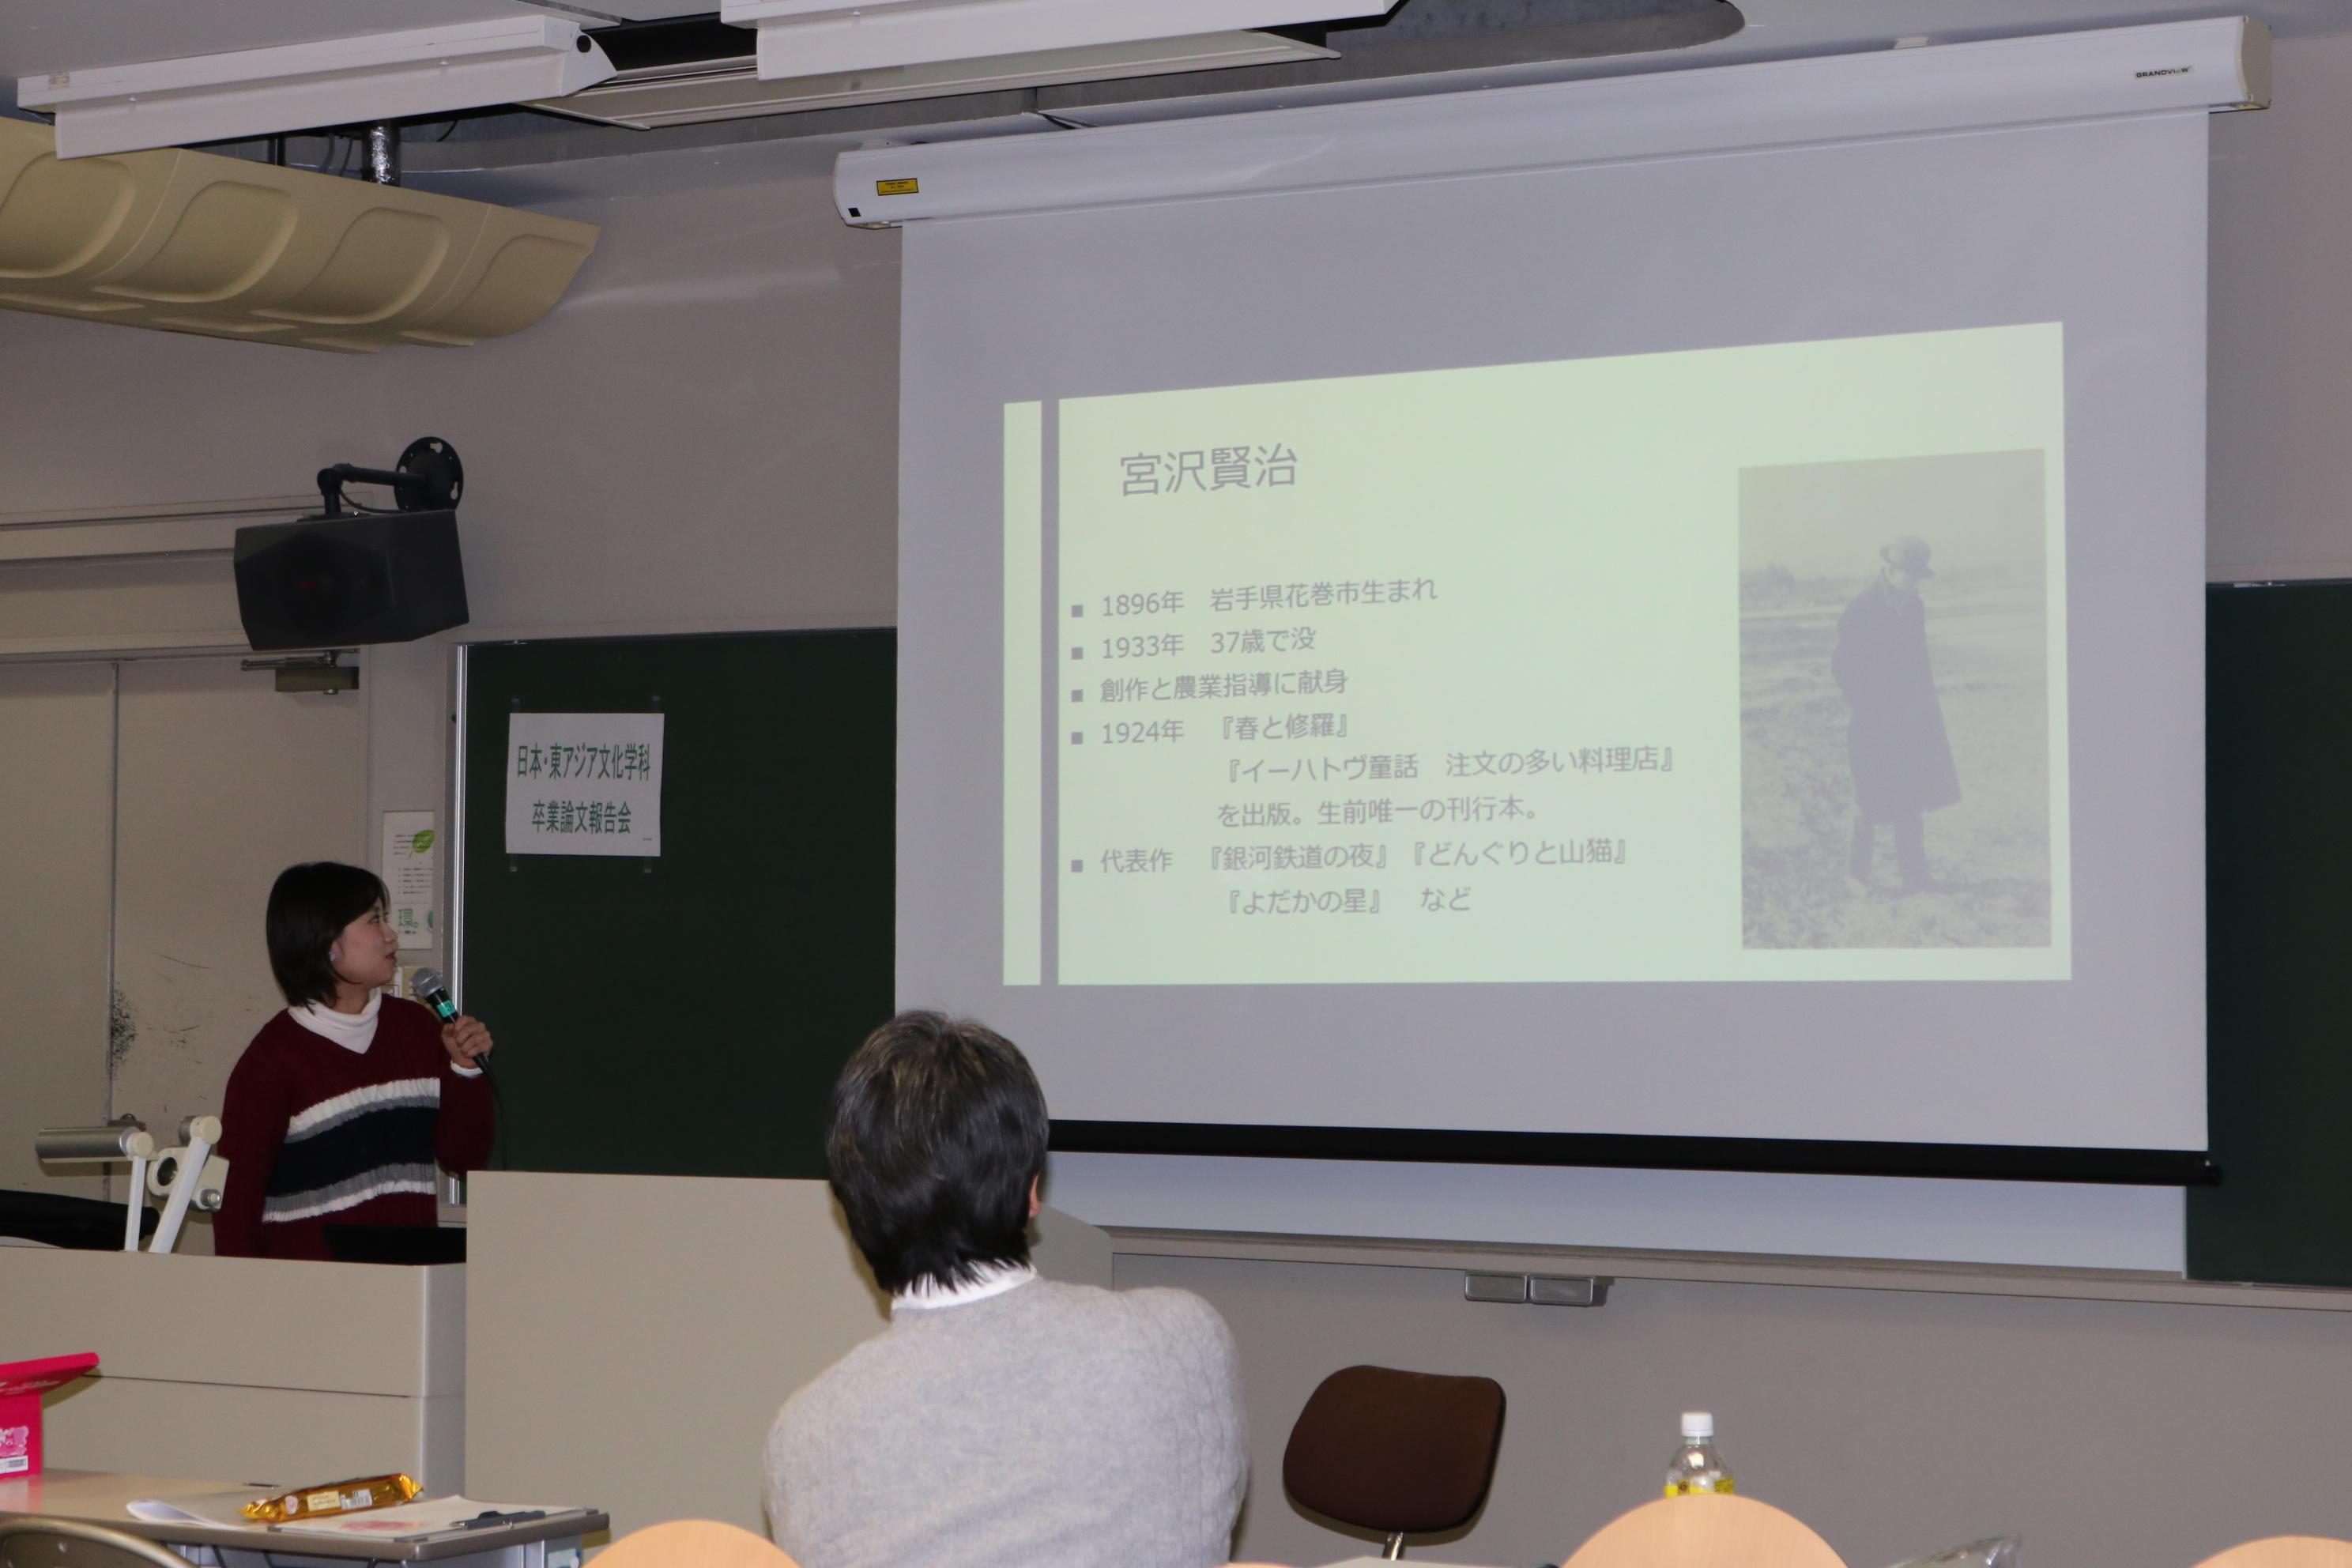 【武蔵大学】1月30日(水)4年間の学びの集大成を一般公開! 人文学部「卒業論文報告会」